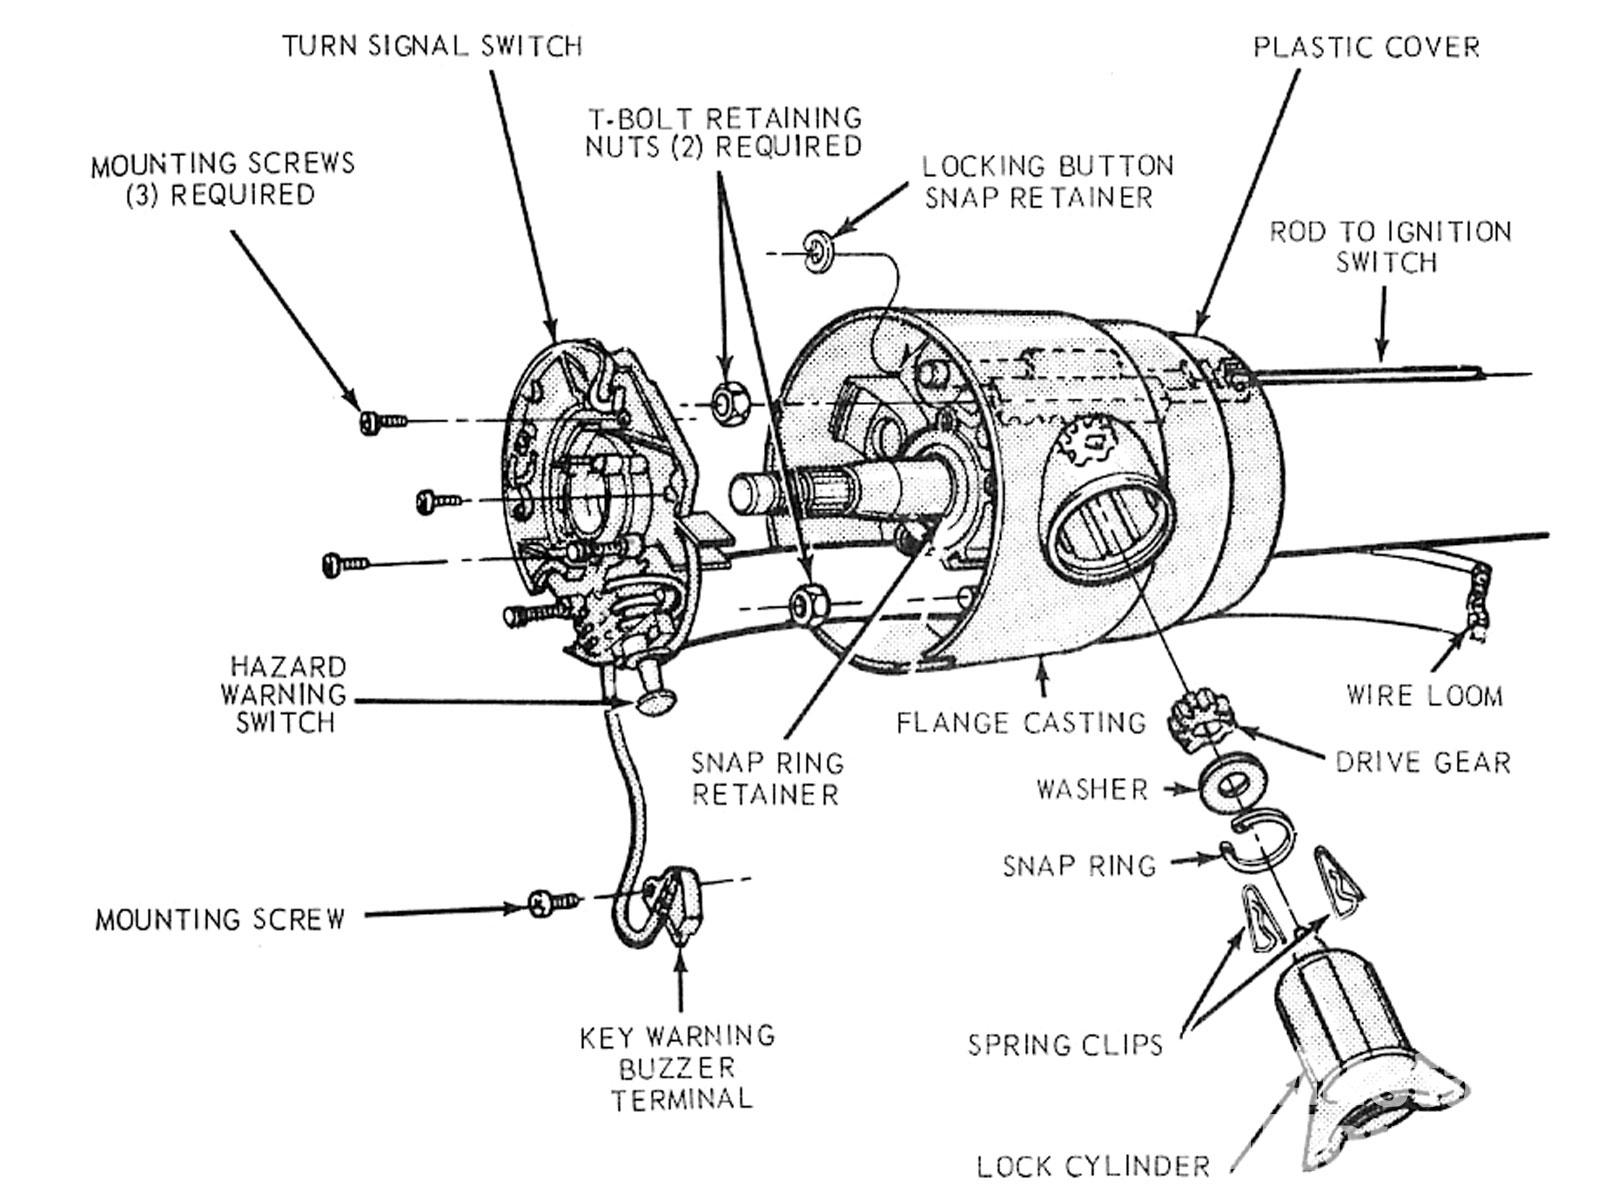 Wiring Adapter F100 To Gm Column | Wiring Diagram - Gm Steering Column Wiring Diagram